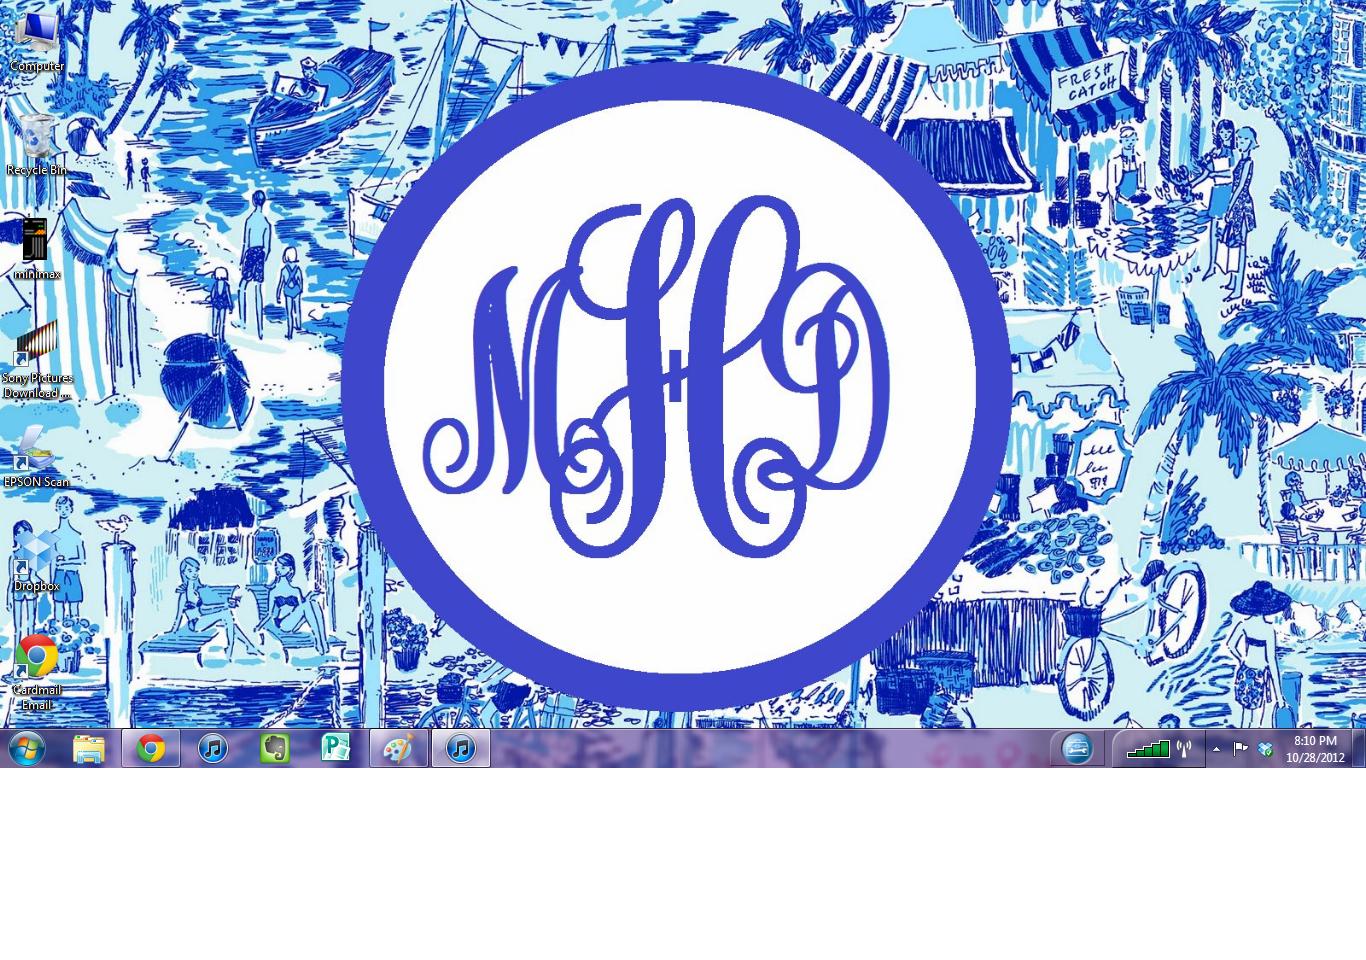 College Girl in Pearls: DIY Monogram Desktop Backgrounds! (Using Microsoft Paint)